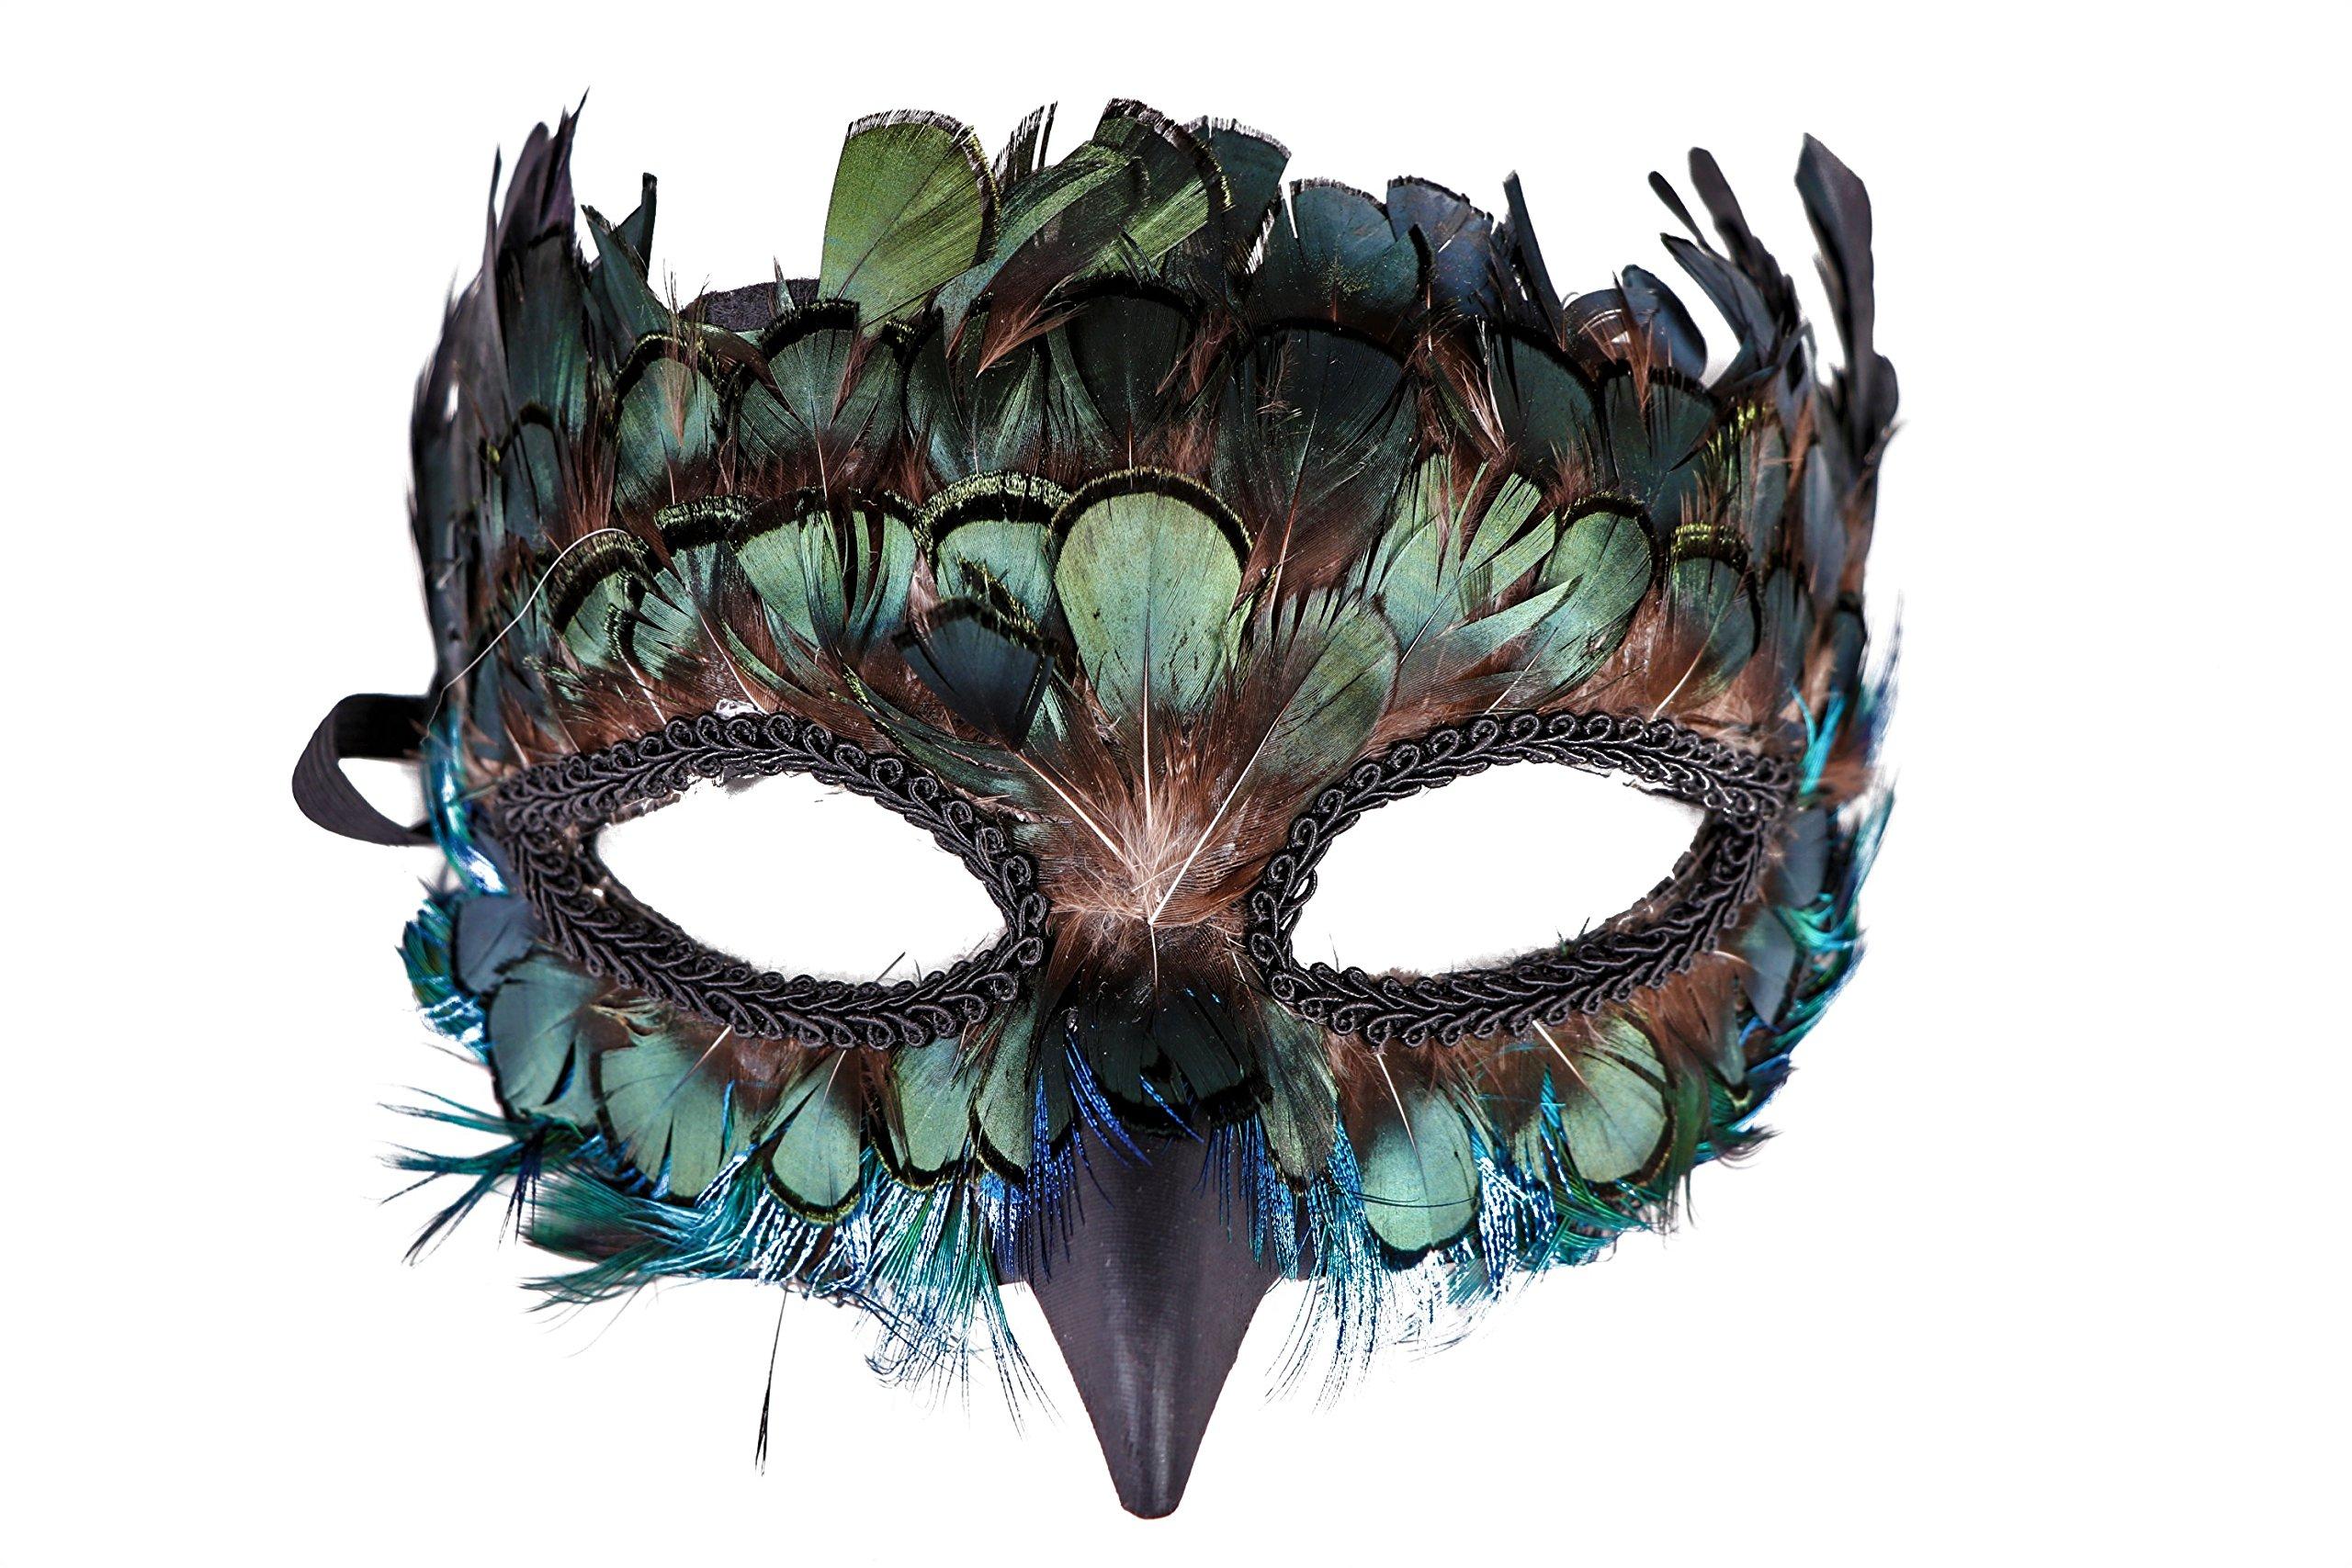 ویکالا · خرید  اصل اورجینال · خرید از آمازون · Western Fashion Peacock Feather Masquerade Mask wekala · ویکالا